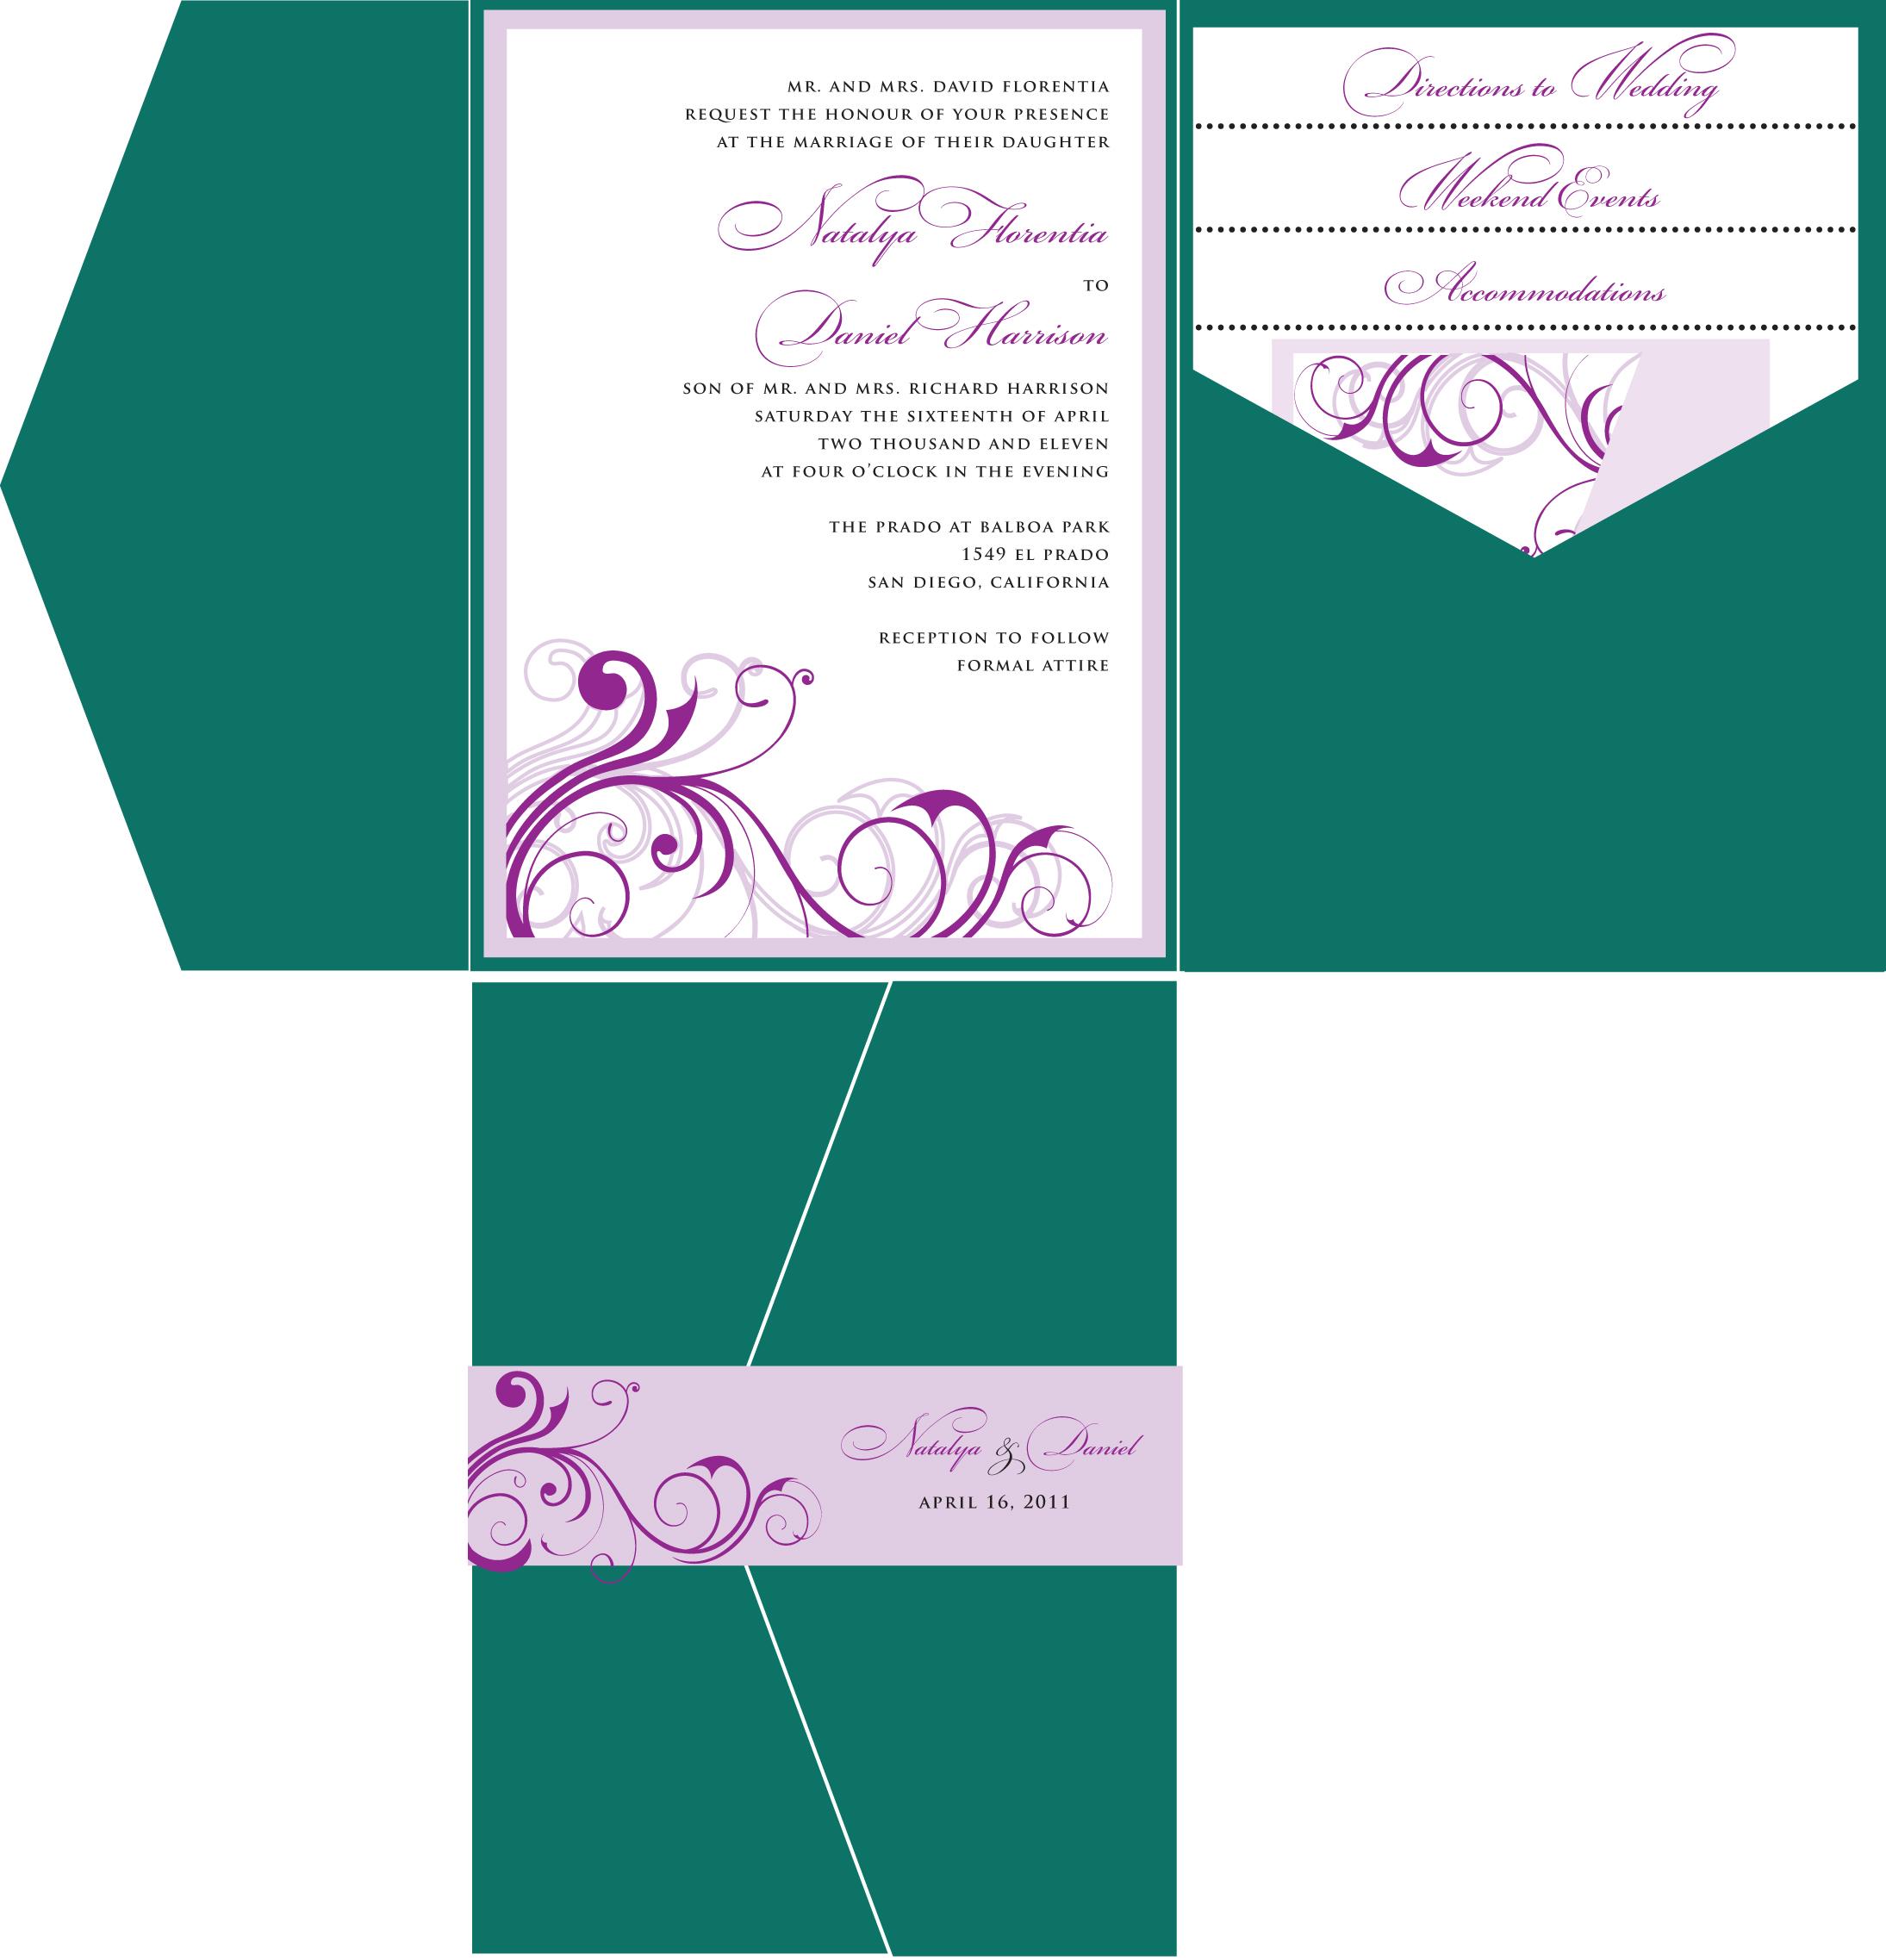 scroll wedding invitation customizable wedding invitations Emerald Green and Lavender Wedding Invitation